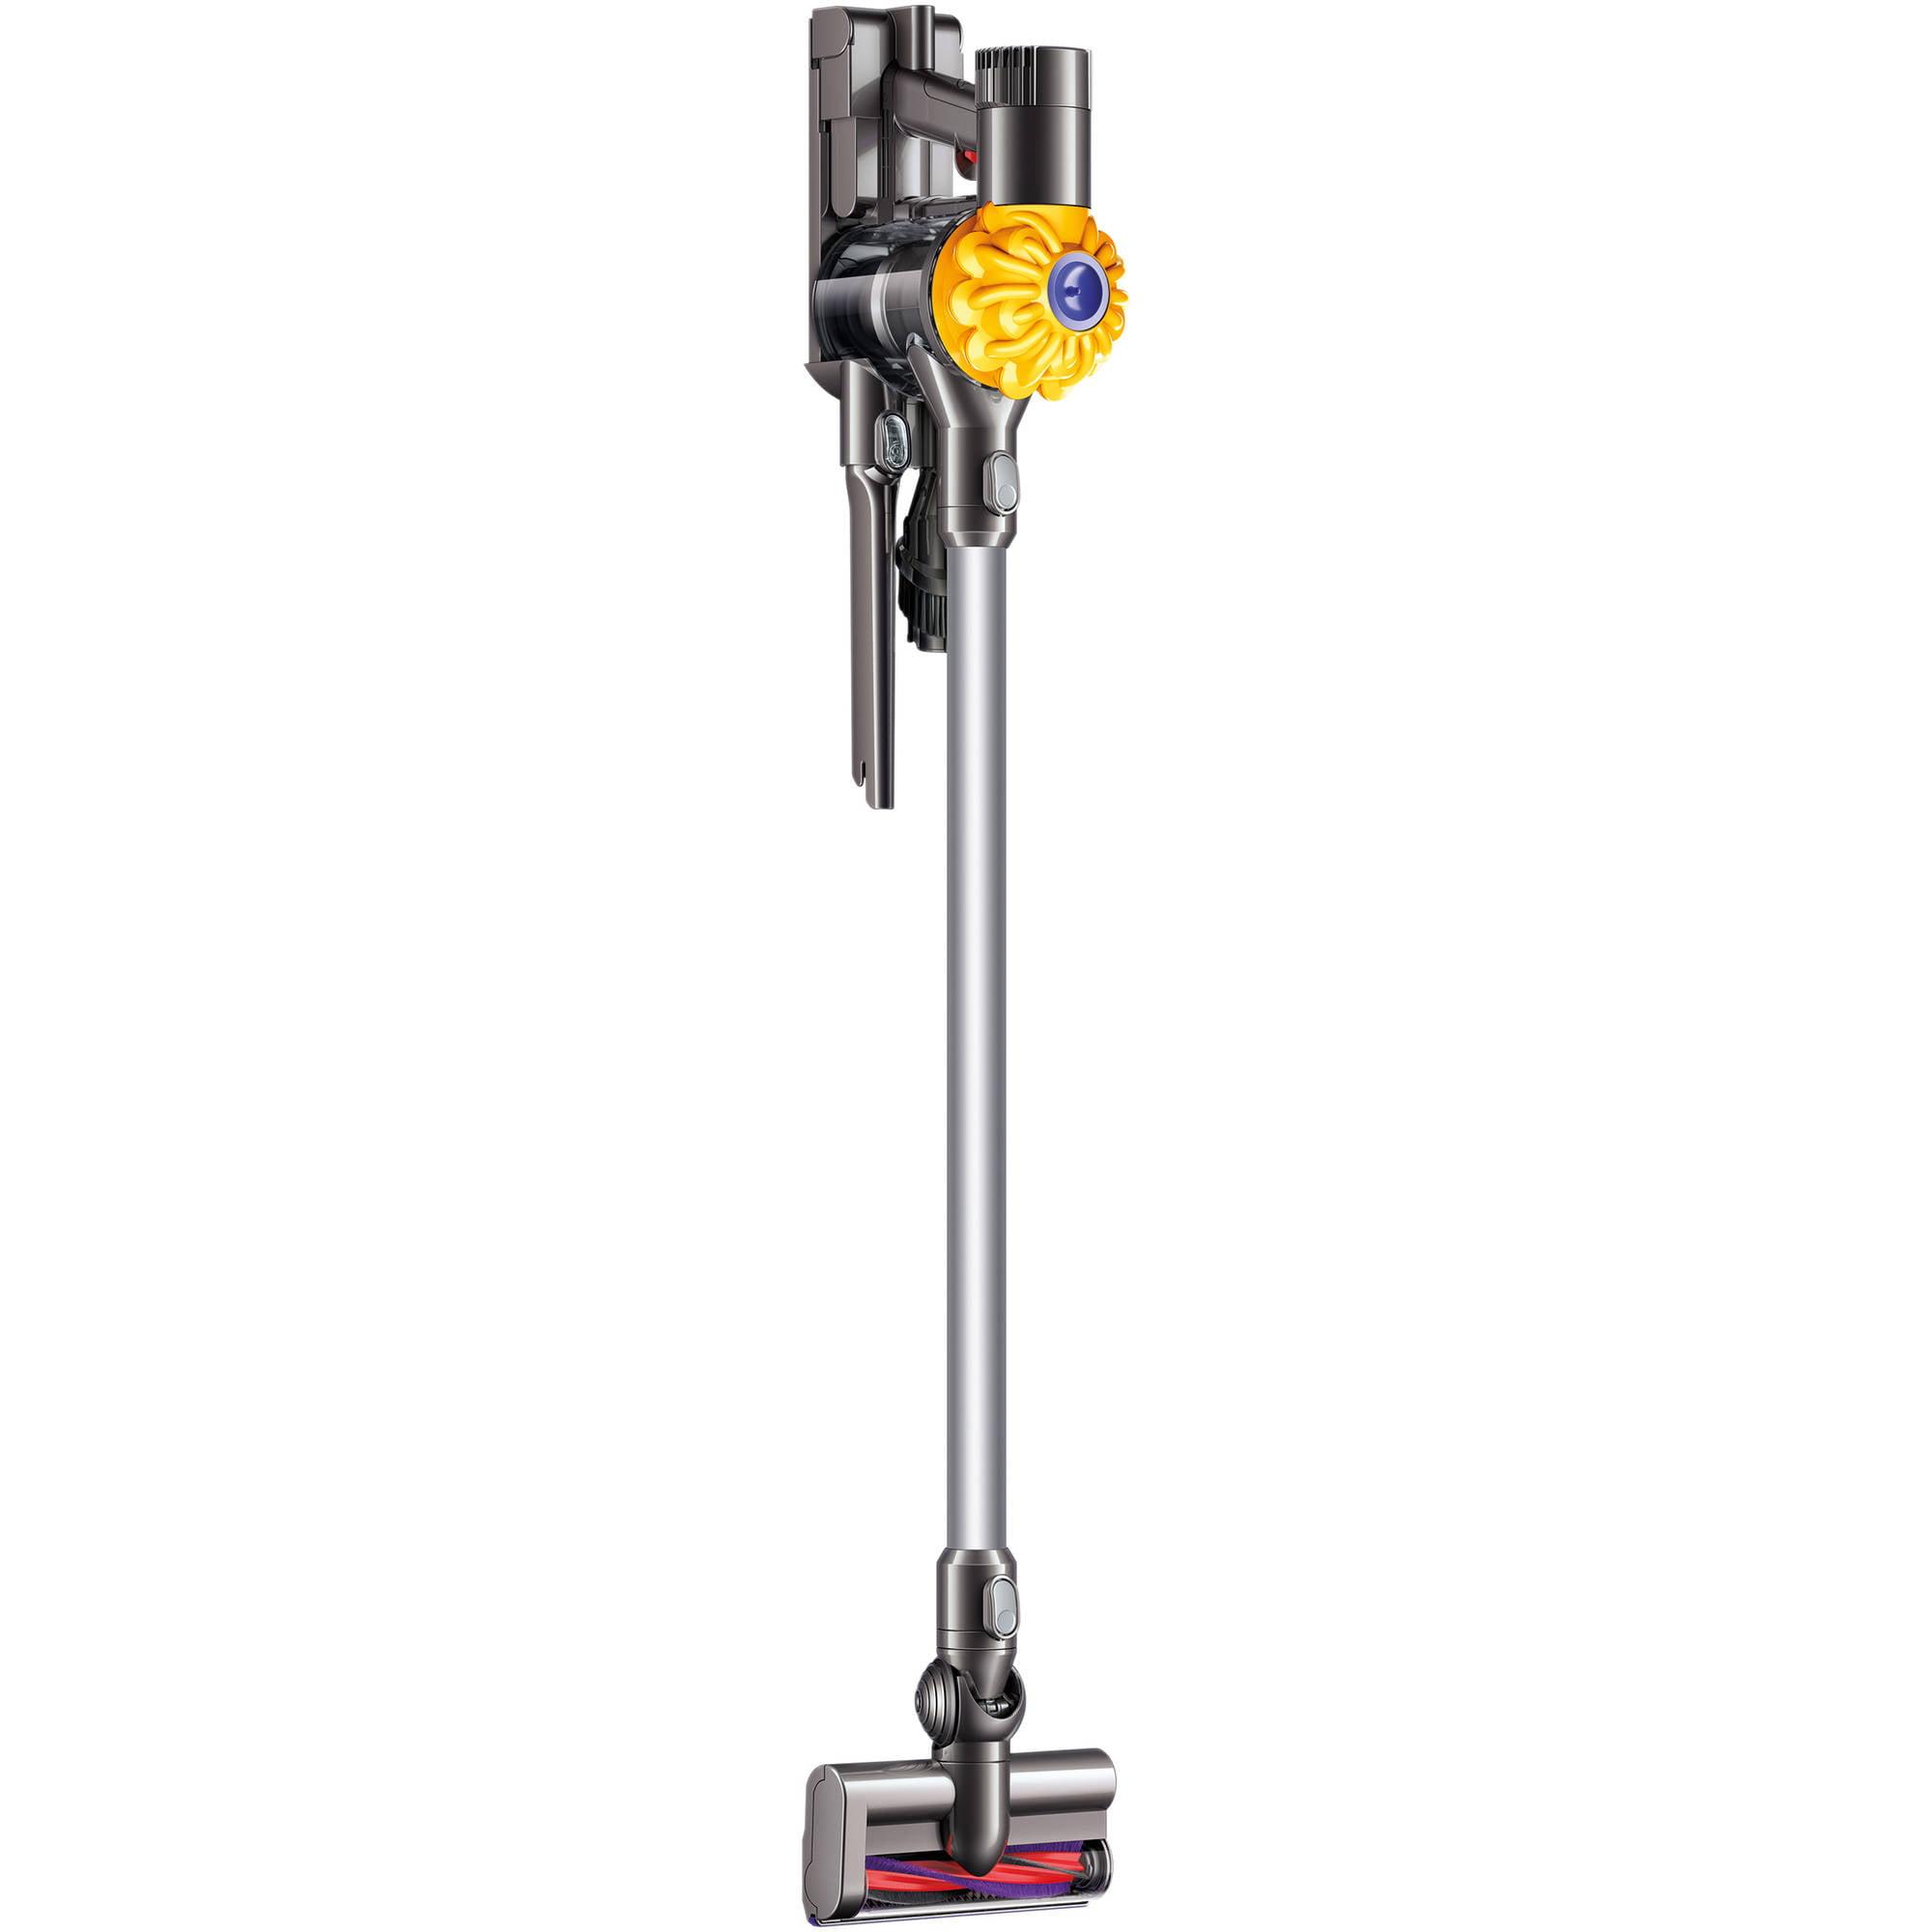 dyson 戴森 v6 cordless vacuum 无线真空吸尘器 $249图片